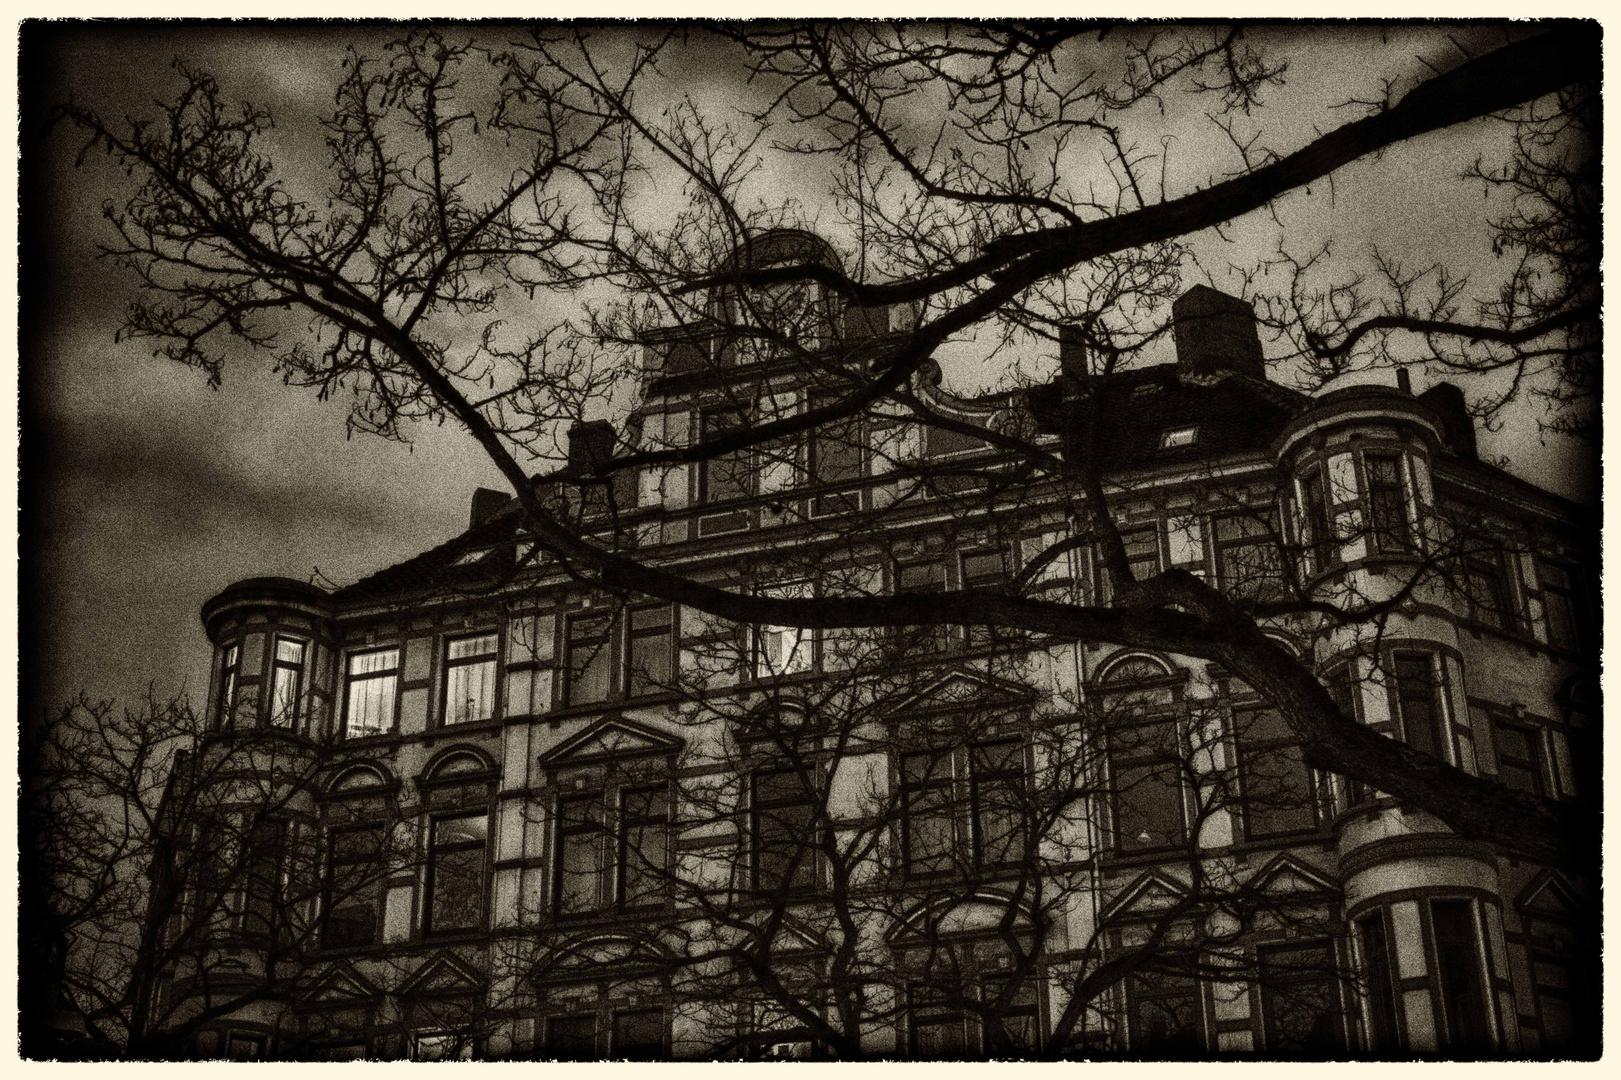 Hannover - List